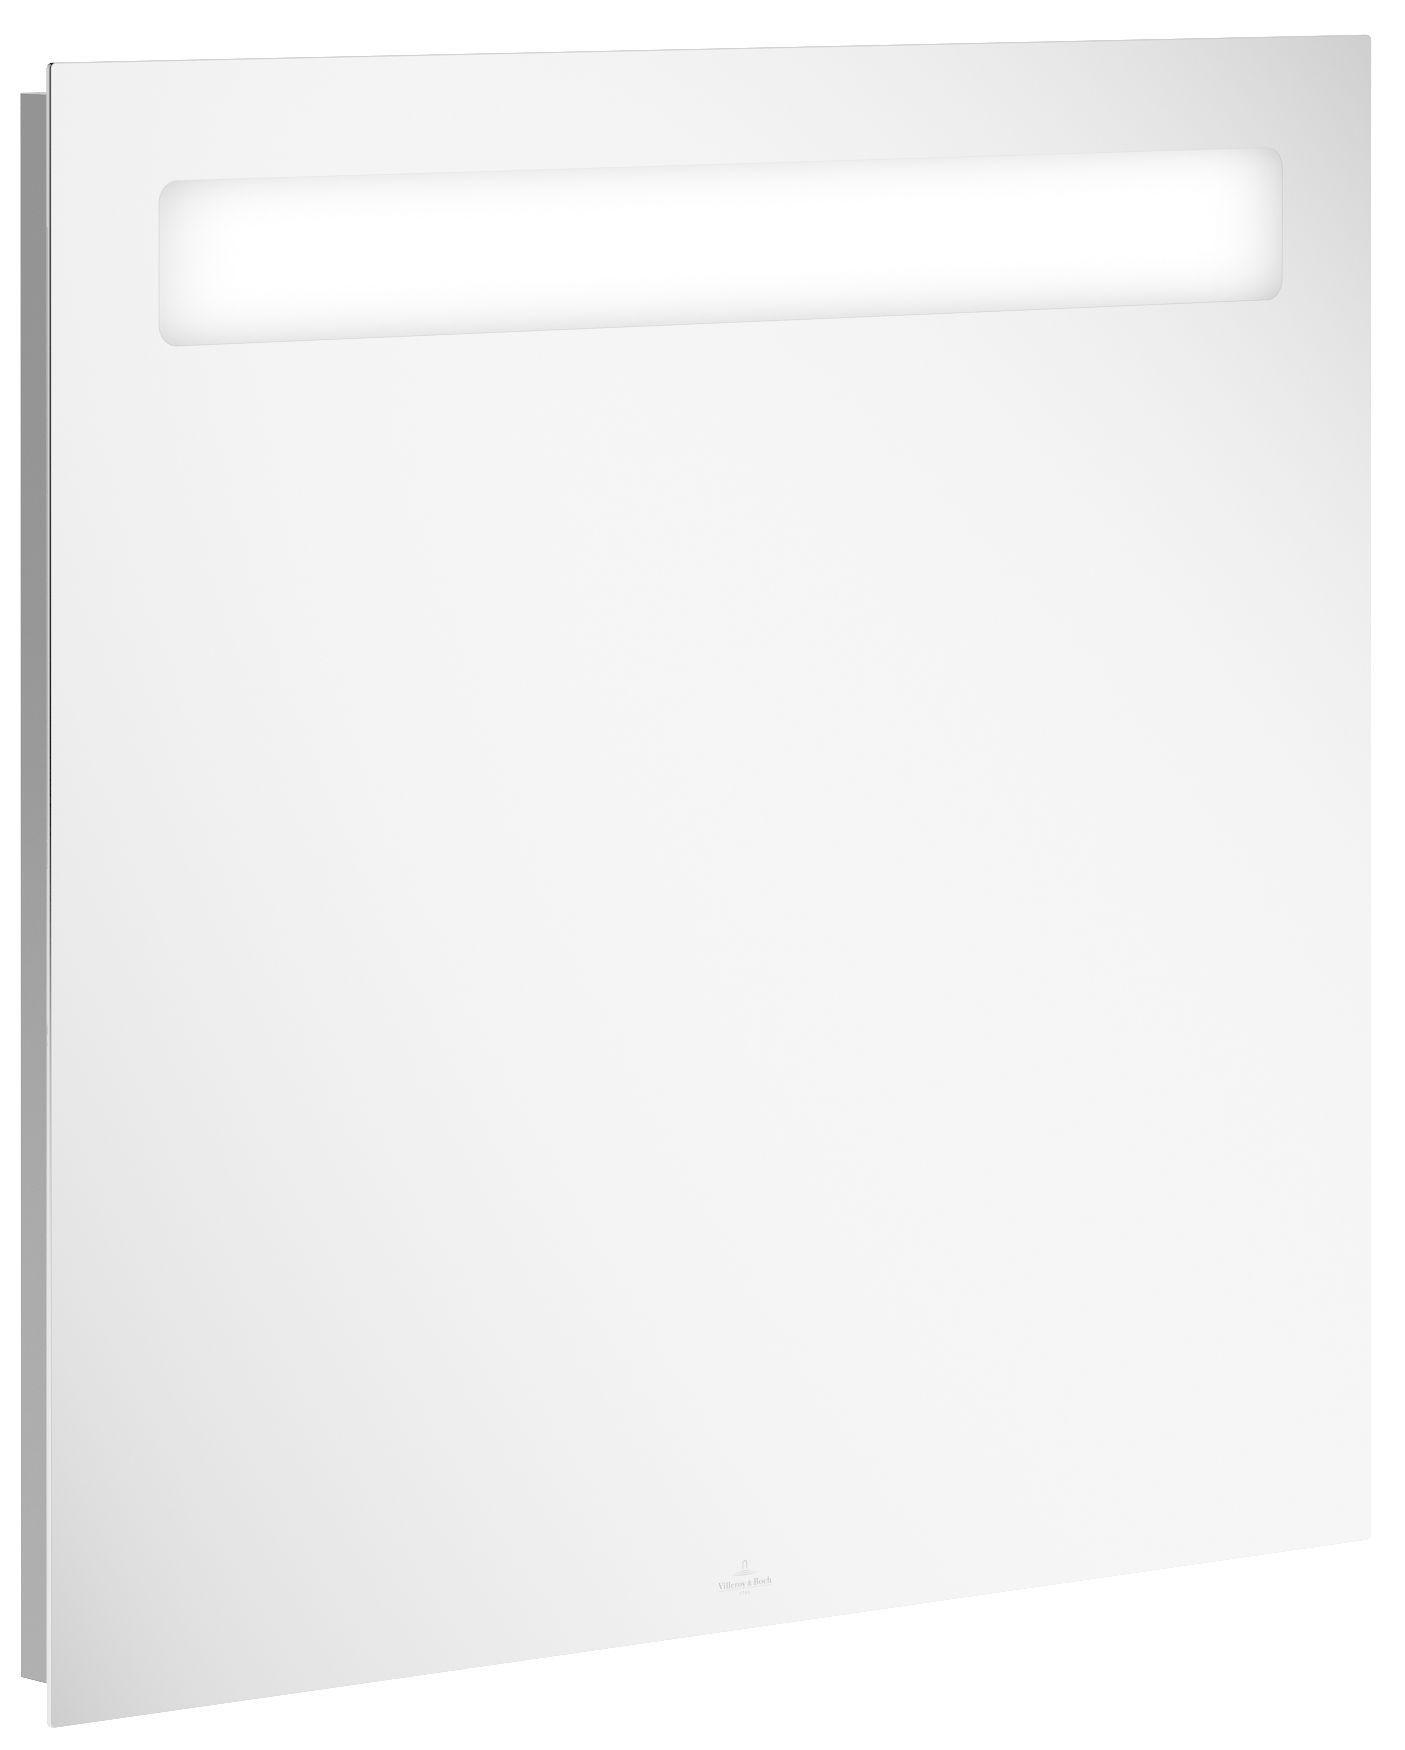 Villeroy & Boch More to See 14 Spiegel mit Beleuchtung  B:70xH:75xT:4,7cm A4327000